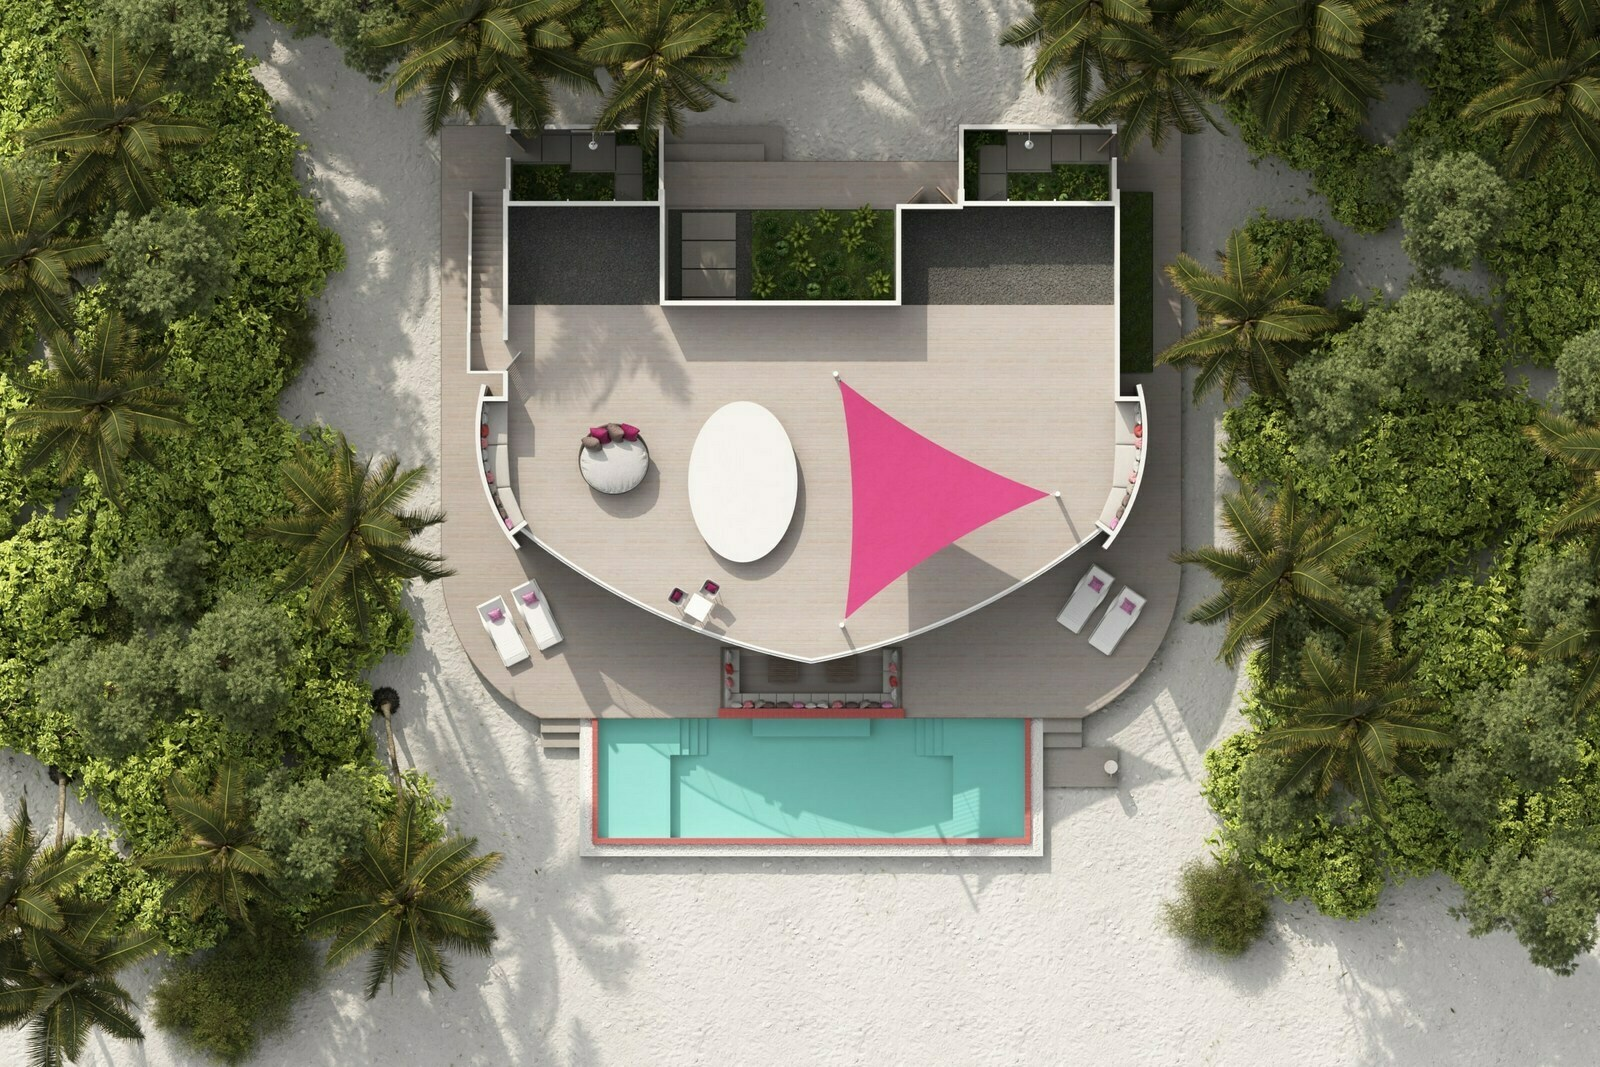 Мальдивы, отель LUX North Male Atoll, план-схема номера Beach Residence 2 Bedroom with Pool